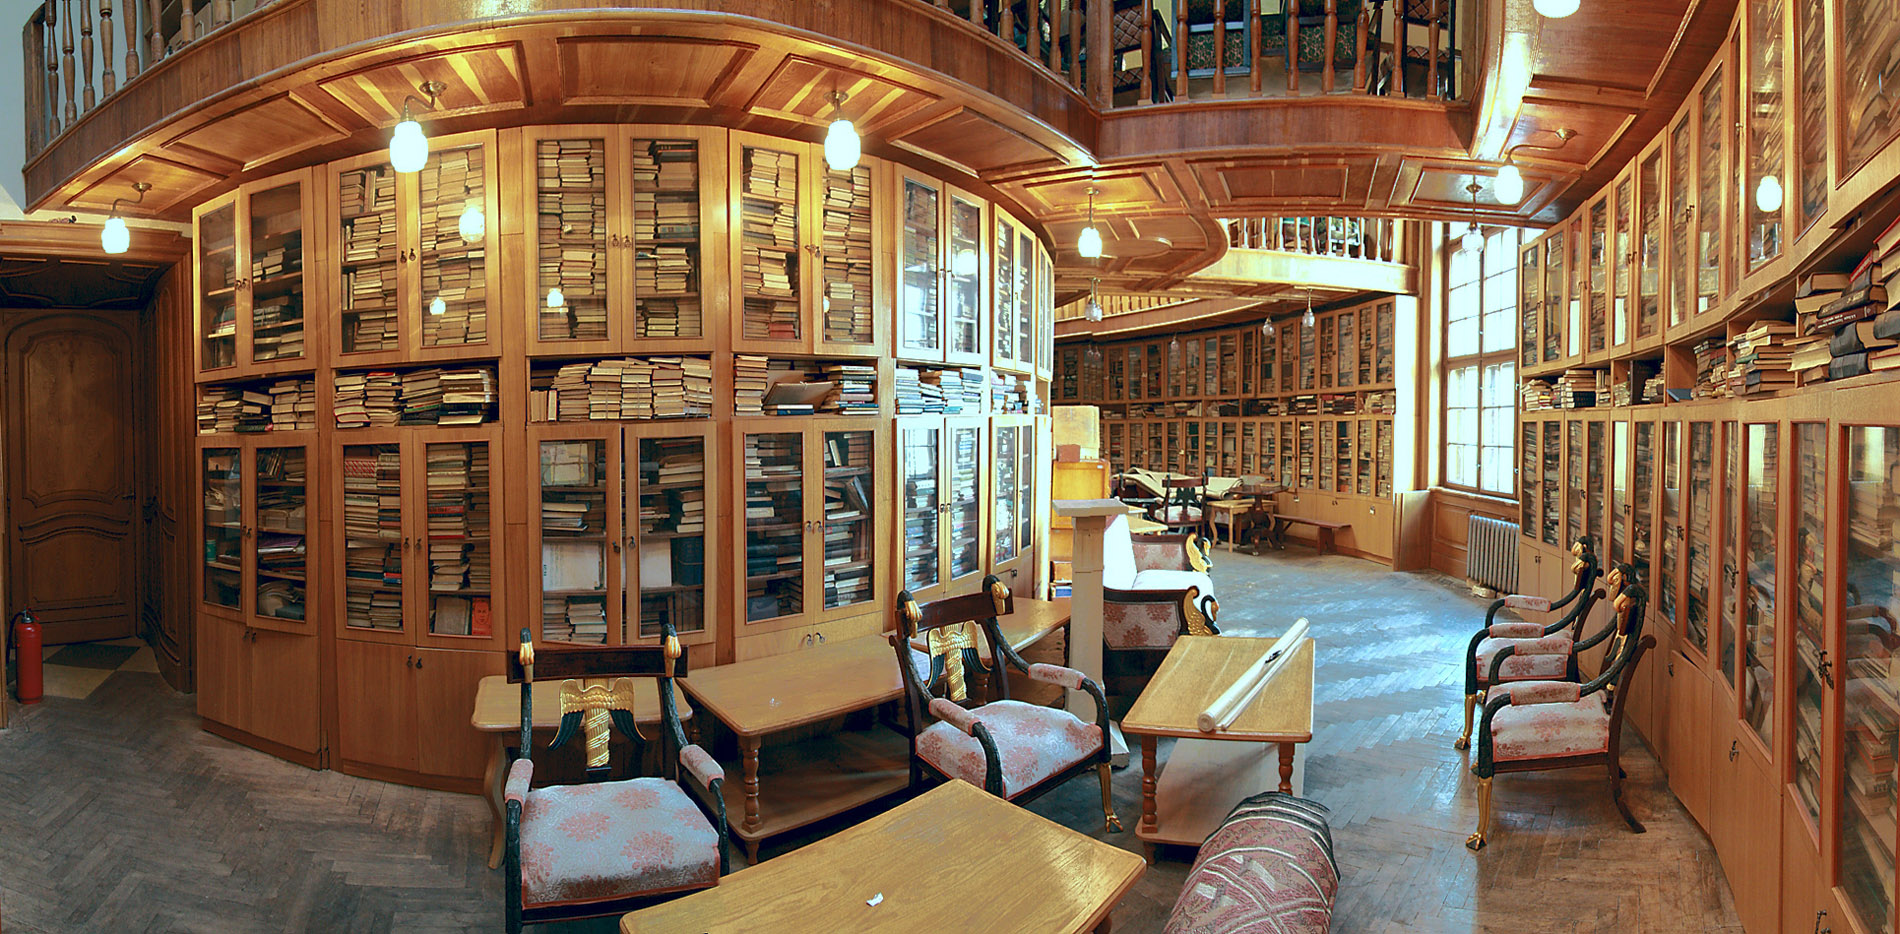 Будинок вчених або Казино Герхарда